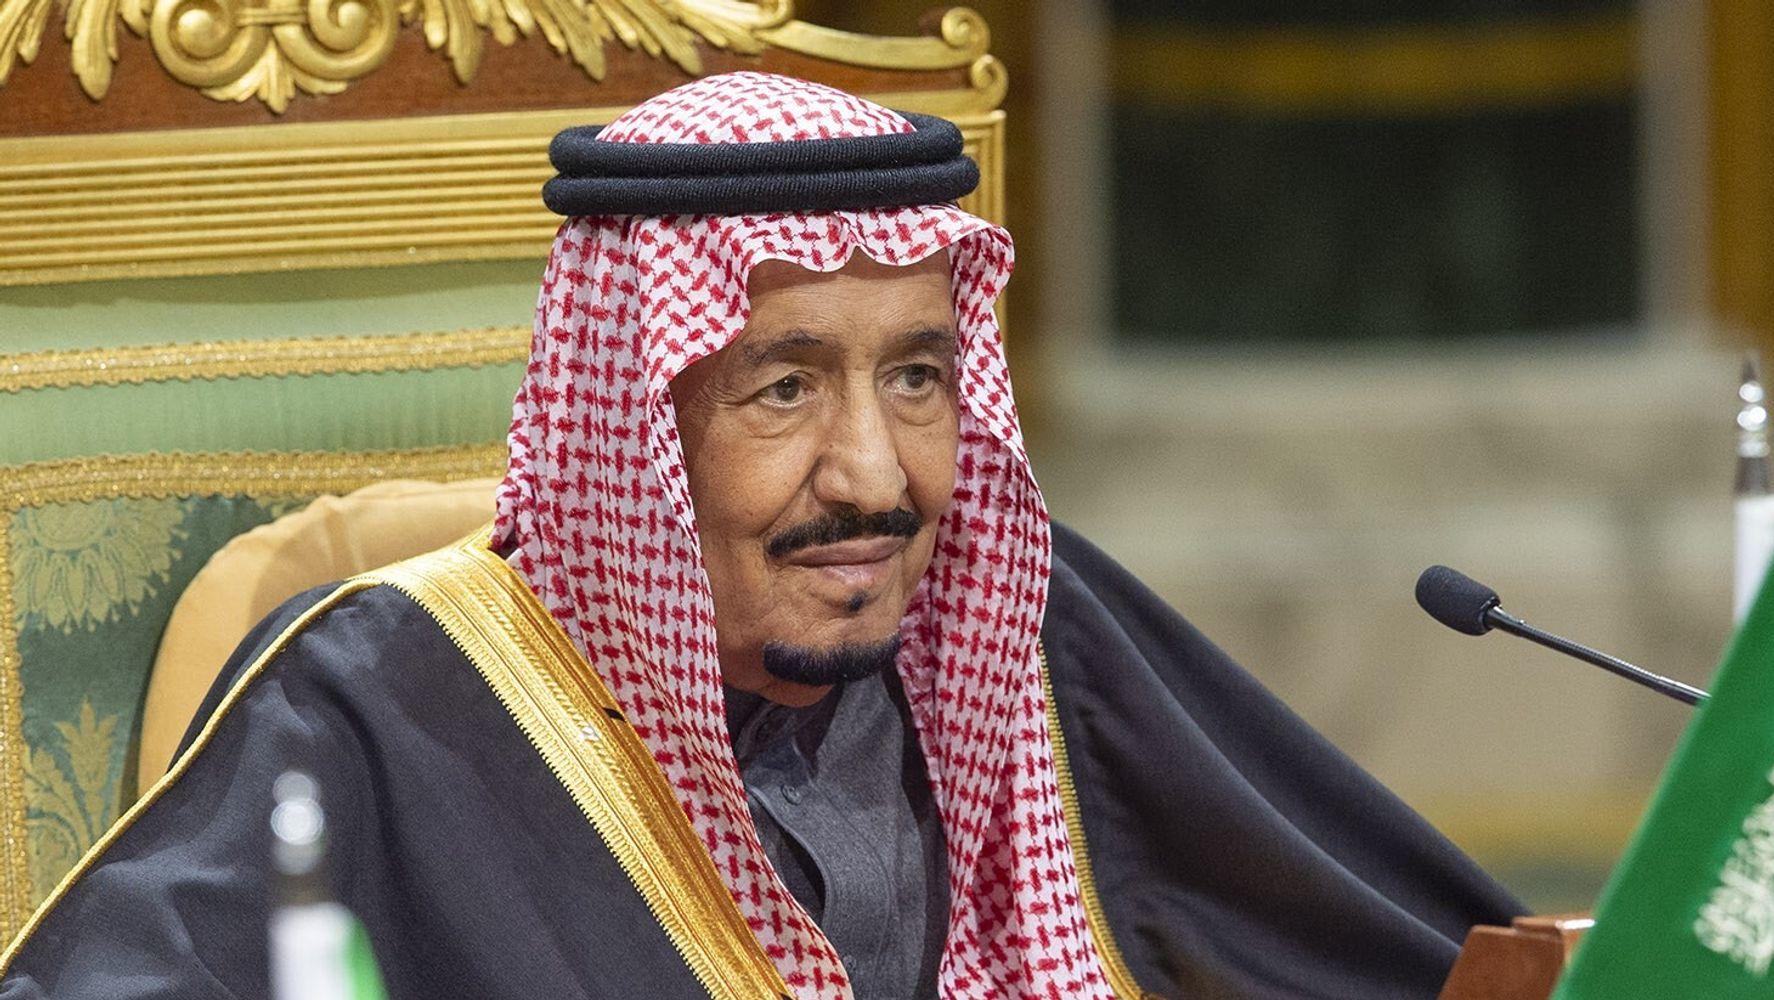 Biden Speaks With Saudi King Amid Expected Report On Killing Of Jamal Khashoggi